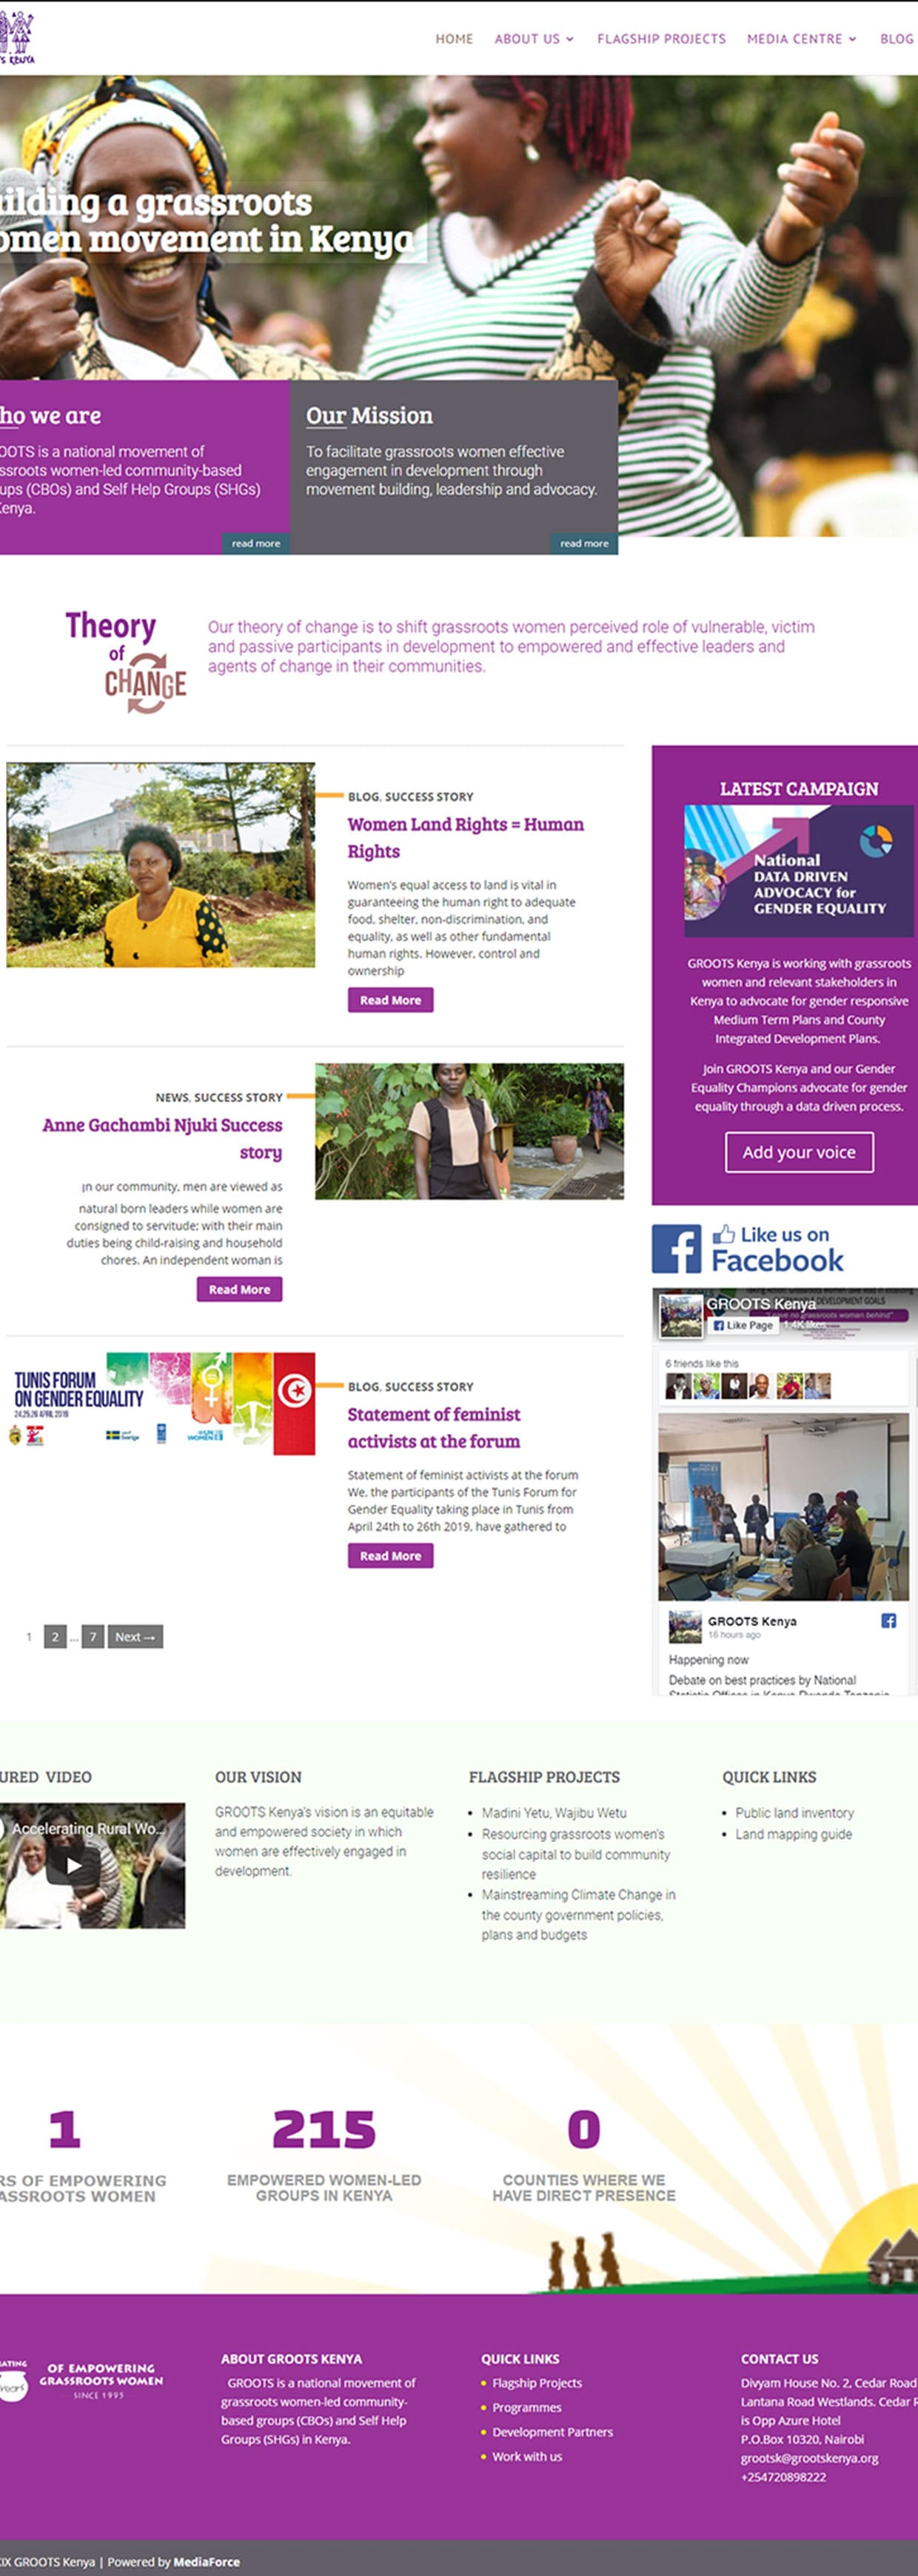 Centre for Minority Rights Development